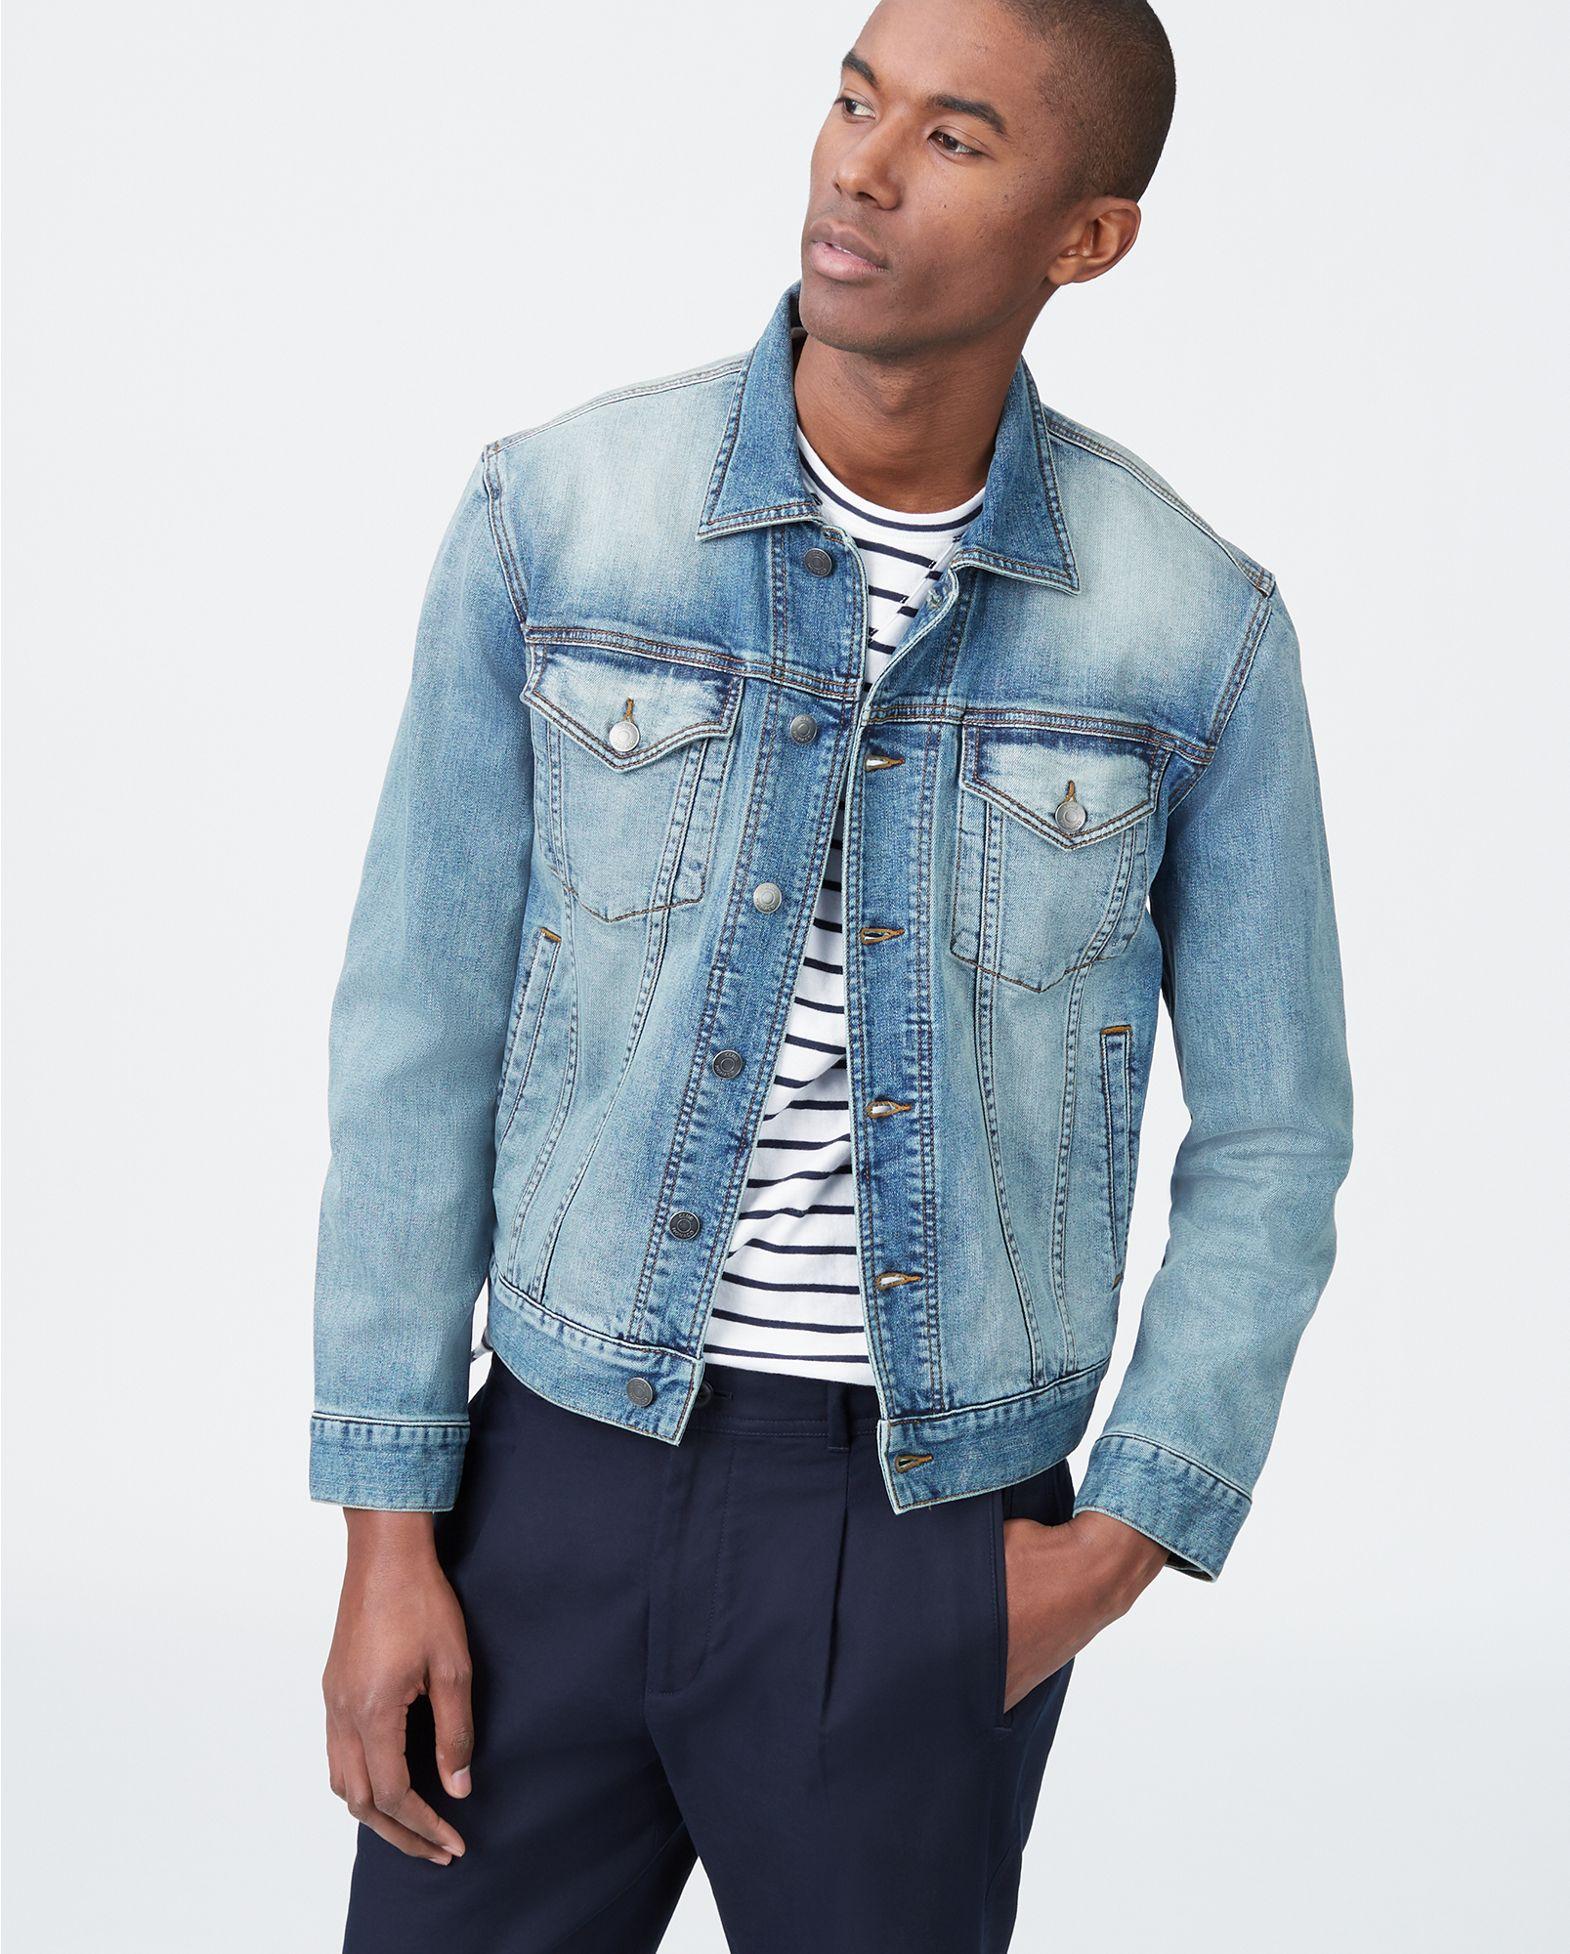 cheap sale find workmanship offer discounts Light Wash Denim Jacket